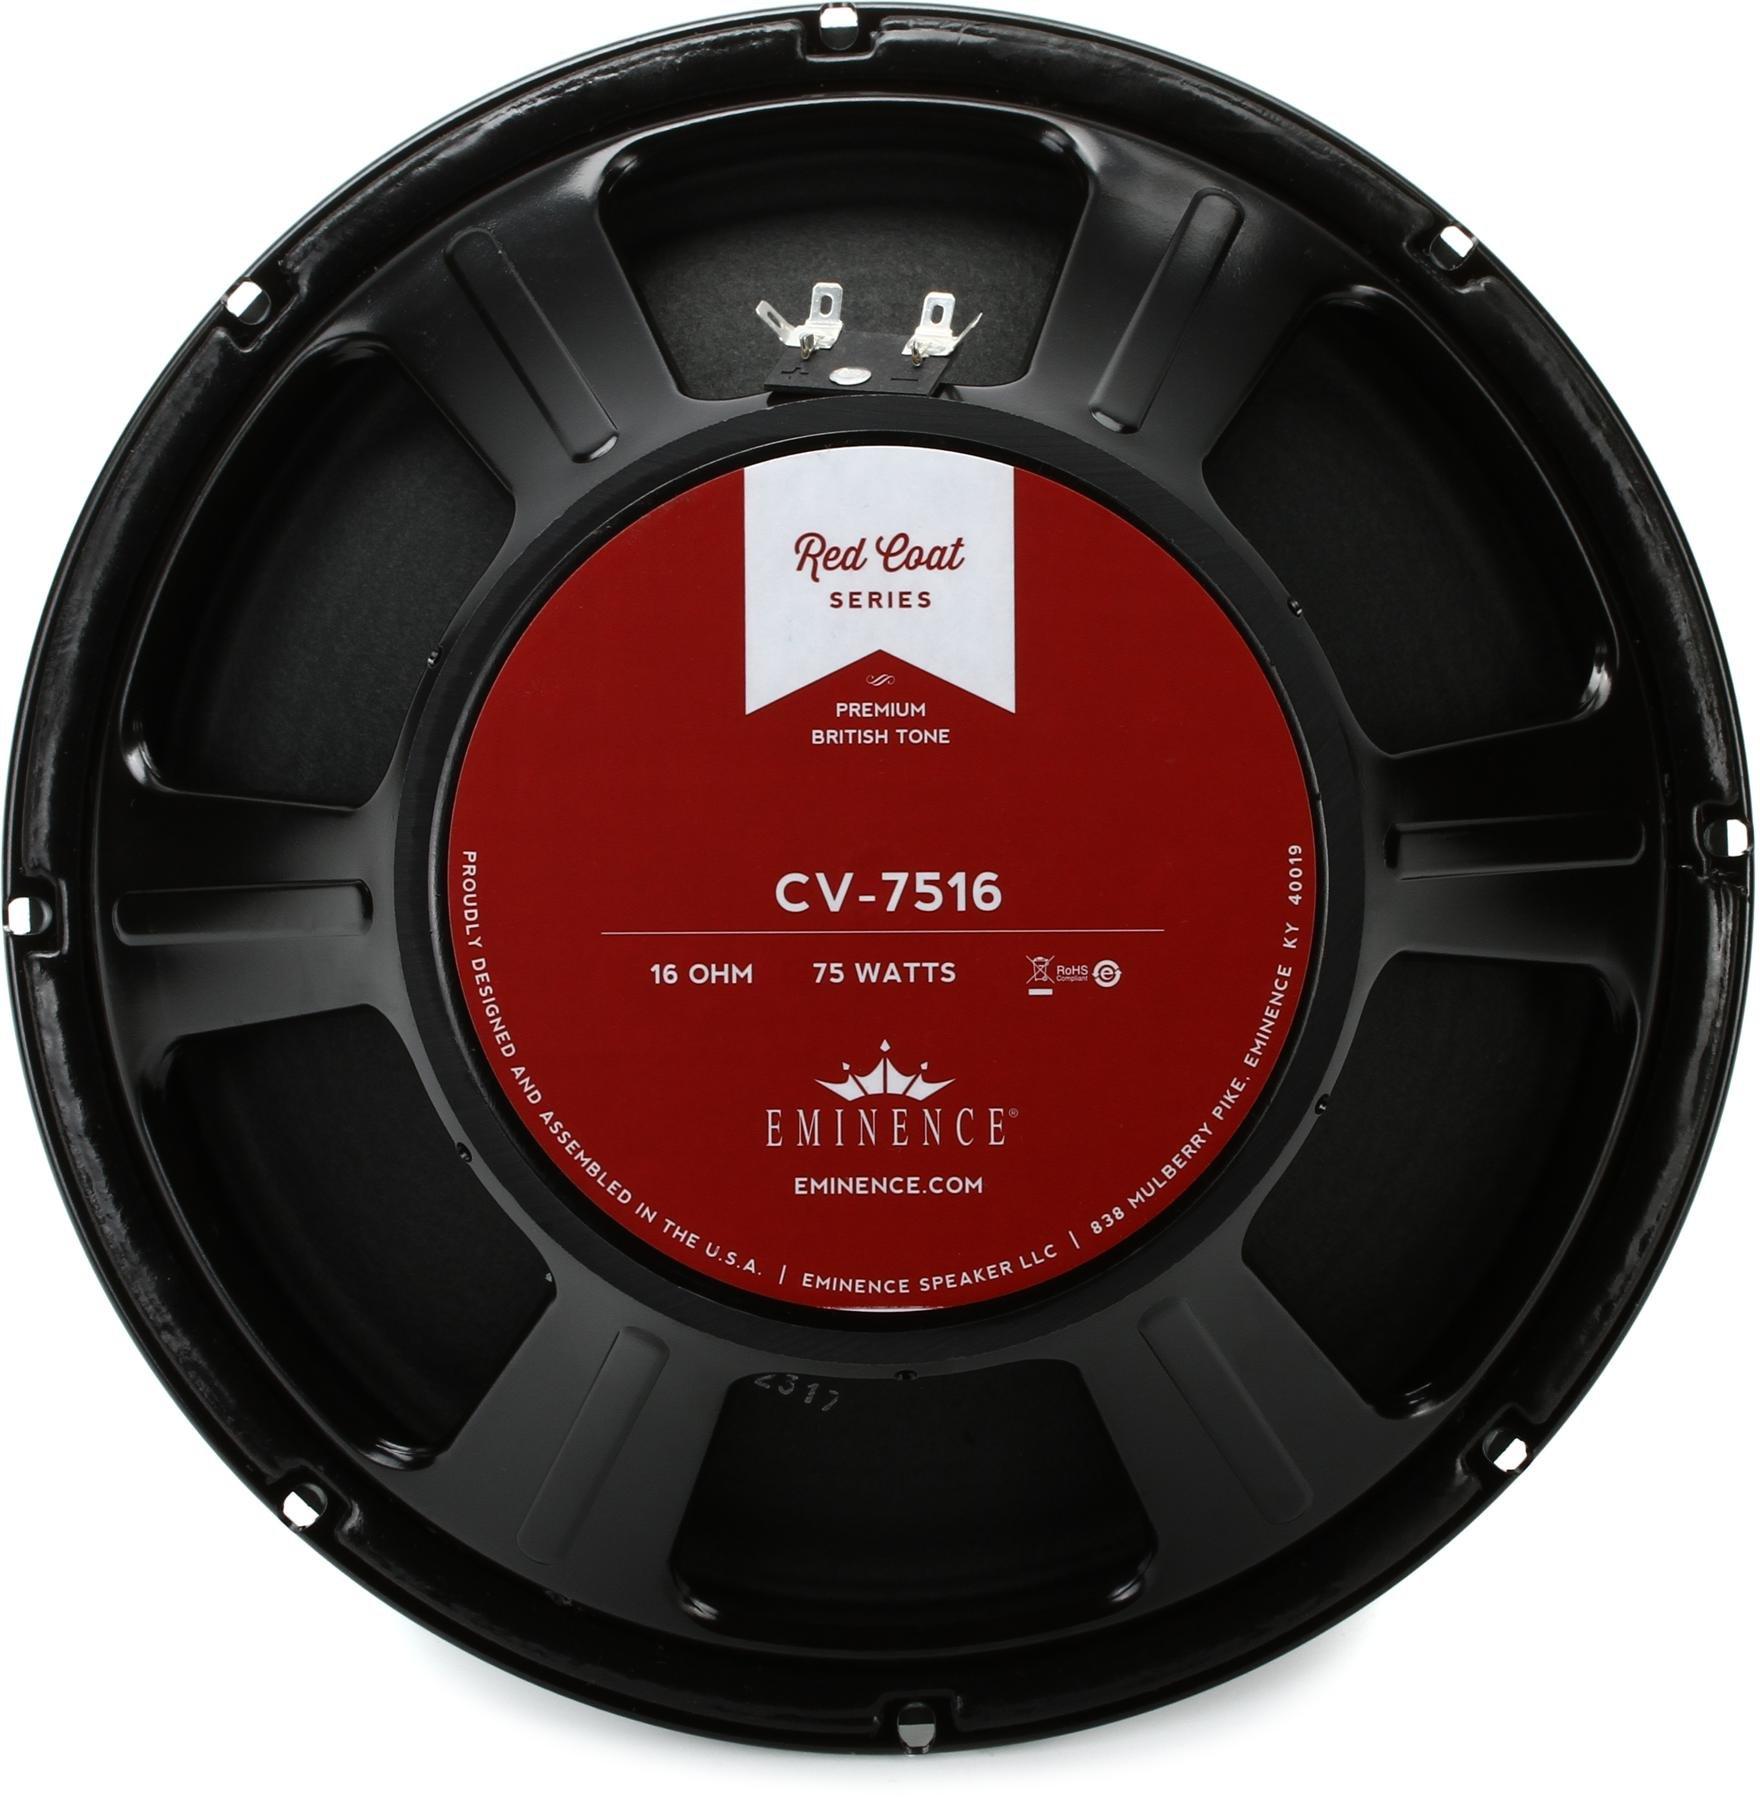 Eminence CV7516 Redcoat Series 12-Inch 75-Watt 16-Ohm Speaker